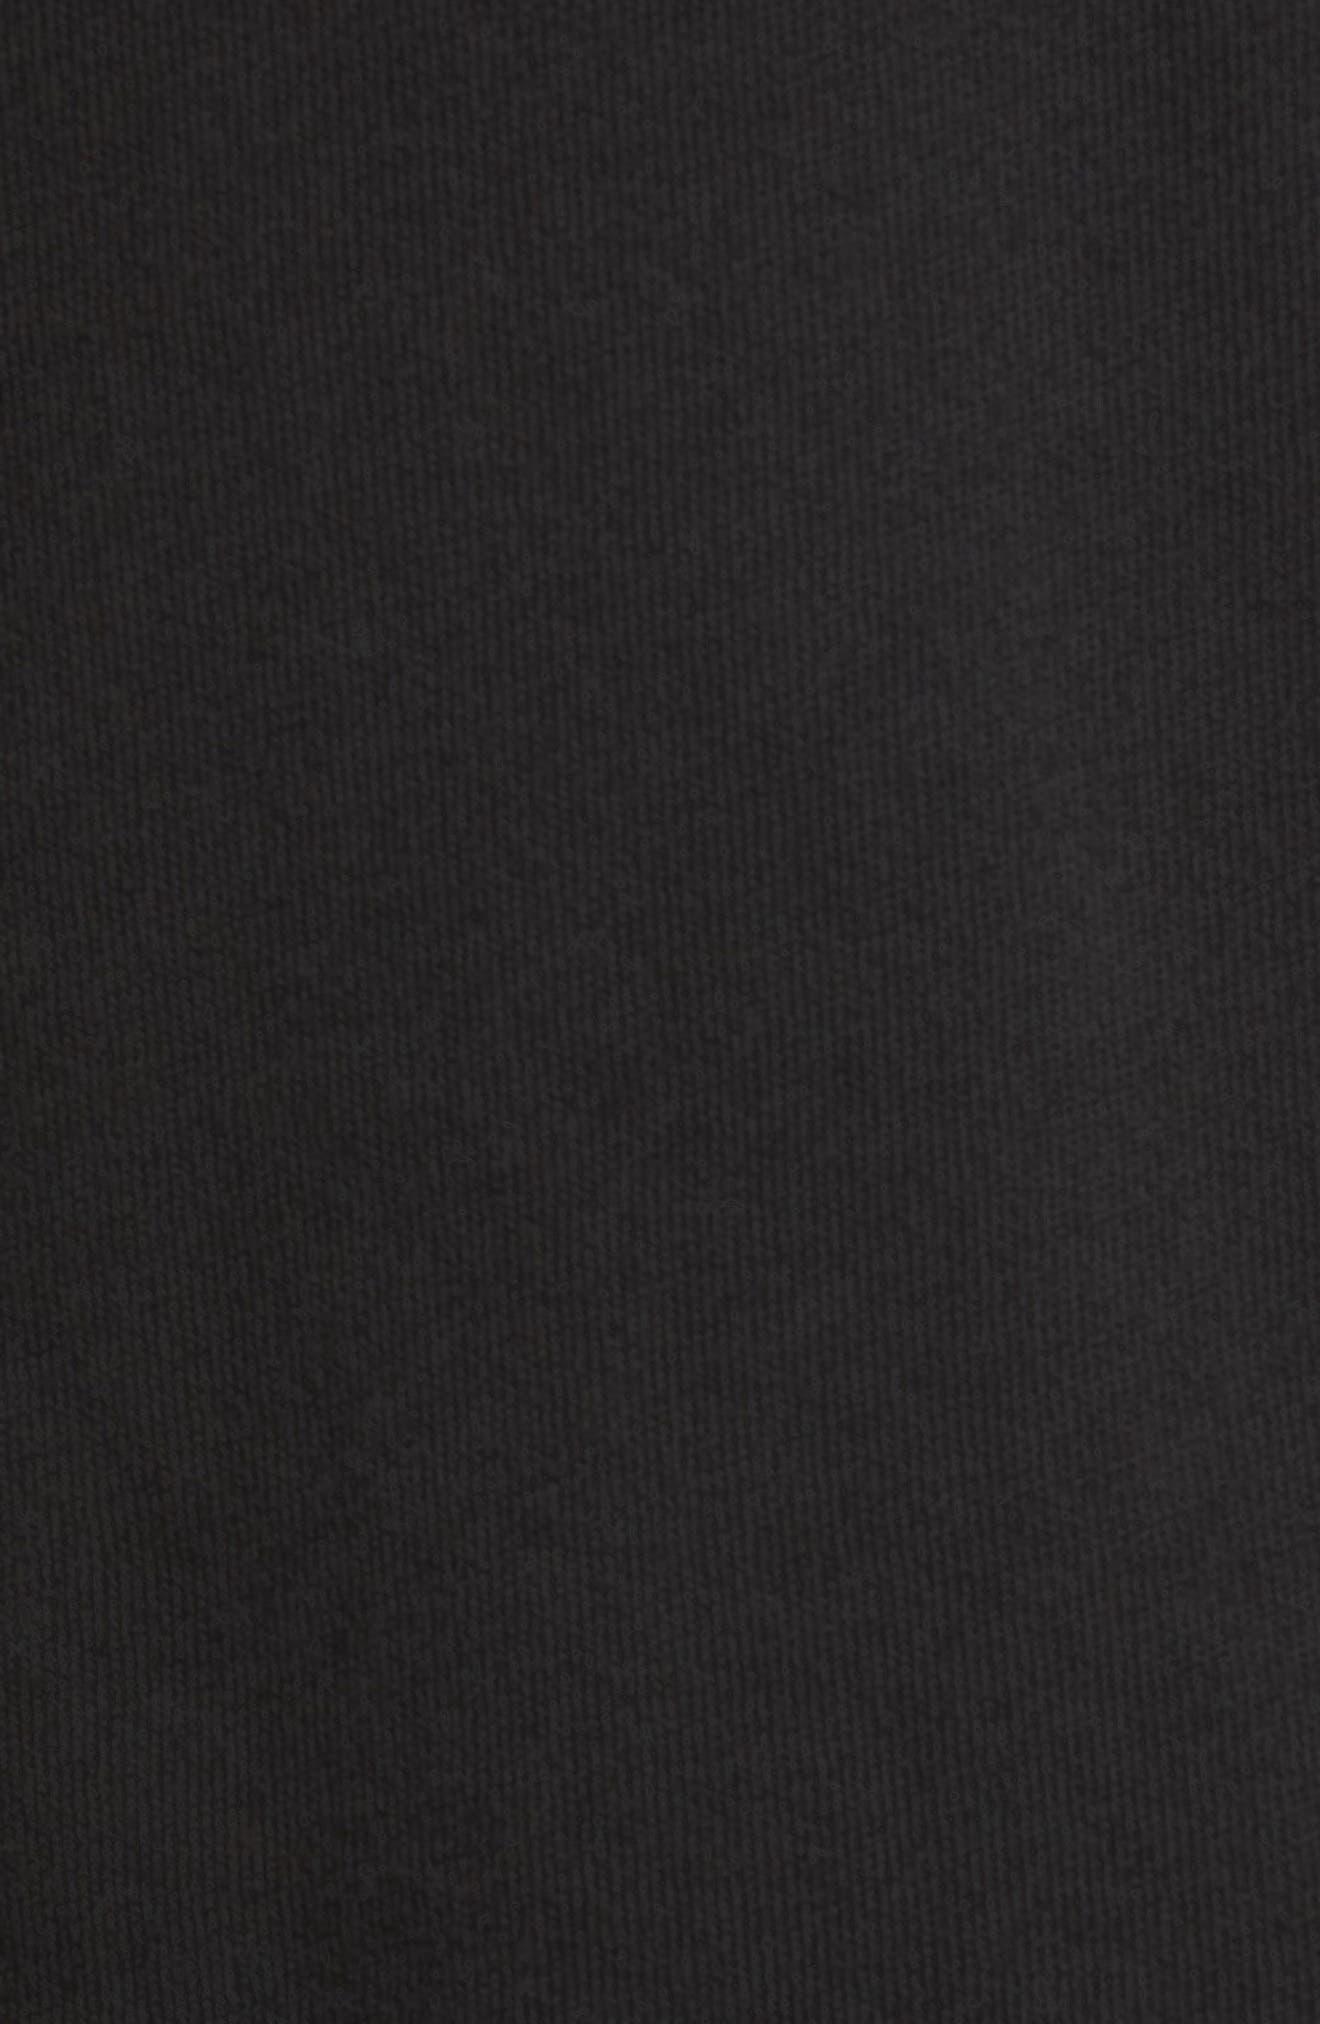 Beverly Hills Crest Sommers Sweatshirt,                             Alternate thumbnail 5, color,                             CLEAN BLACK